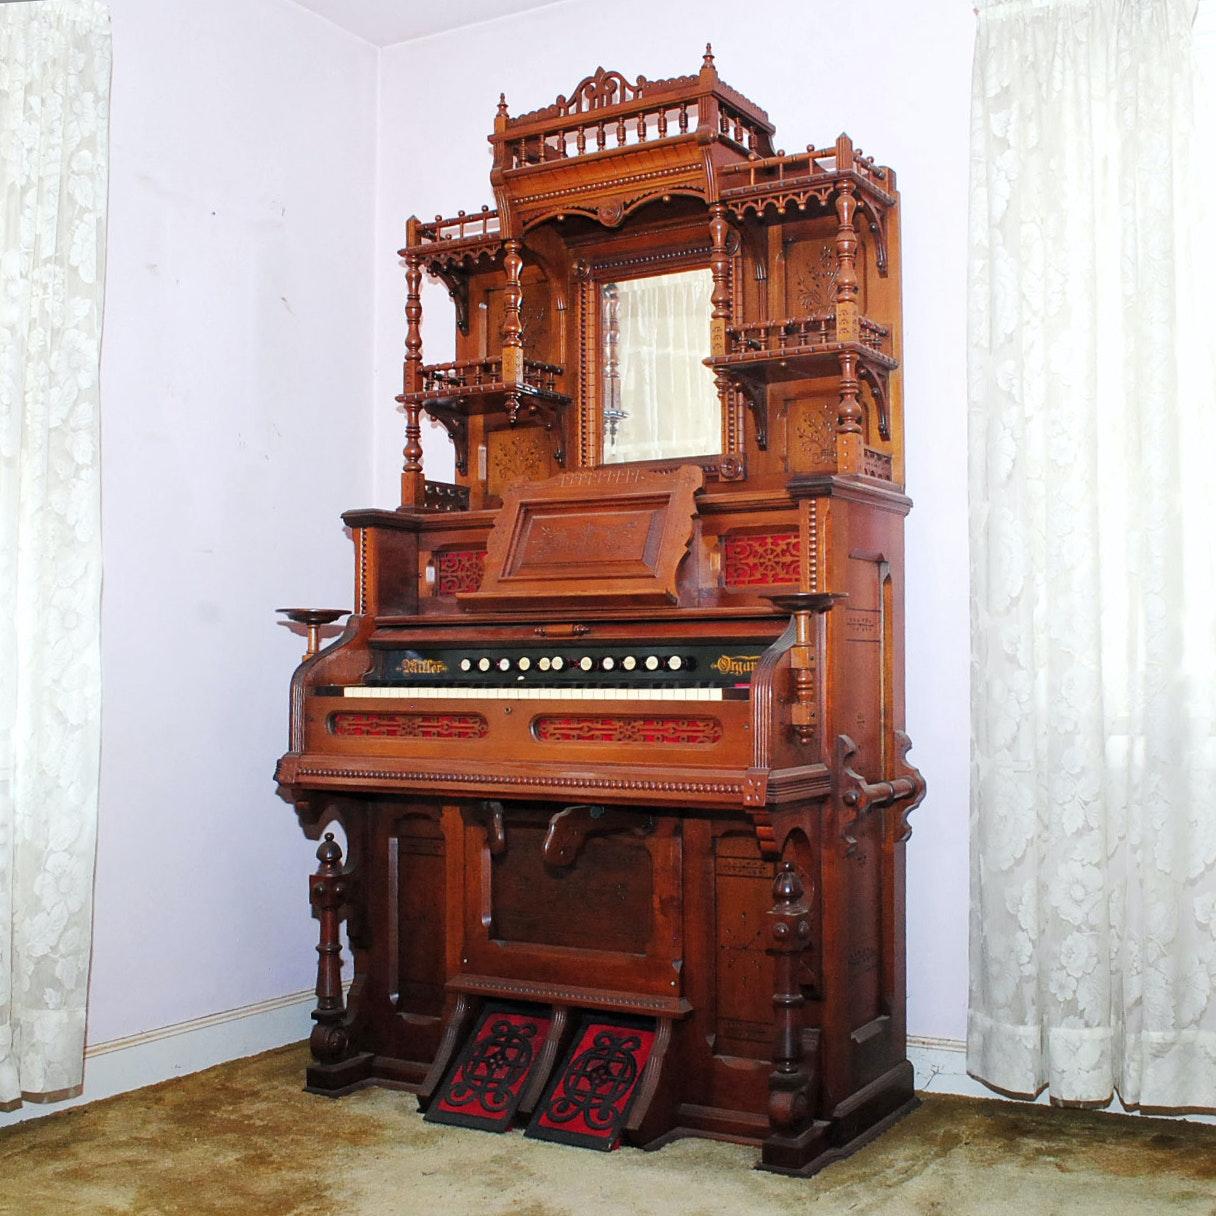 Antique Eastlake Miller Company Pump Organ